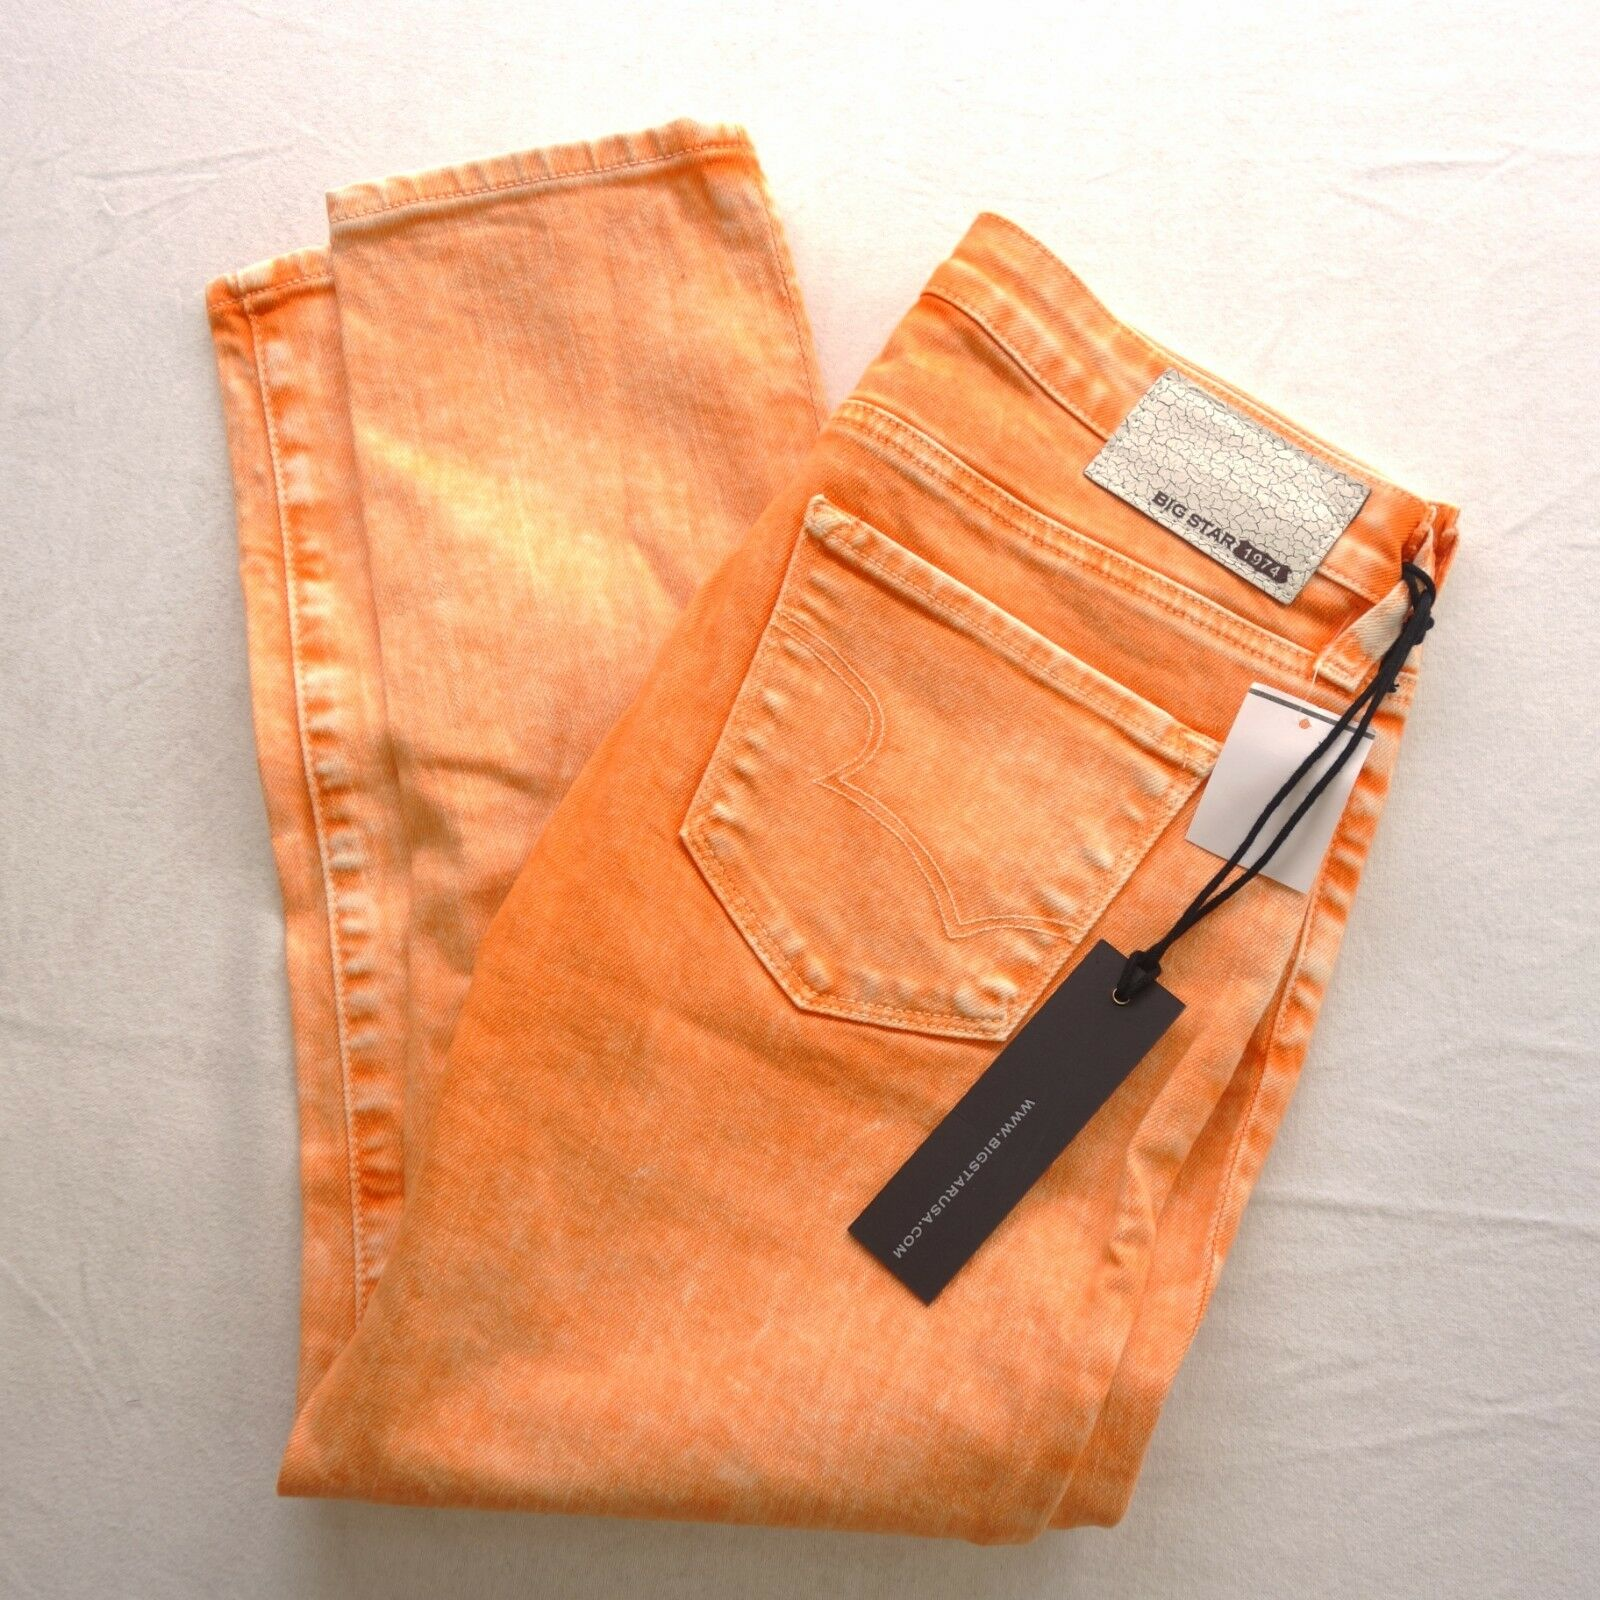 New Big Star orange Dream Skinny Ankle Jeans Low Rinse Jeans US 26